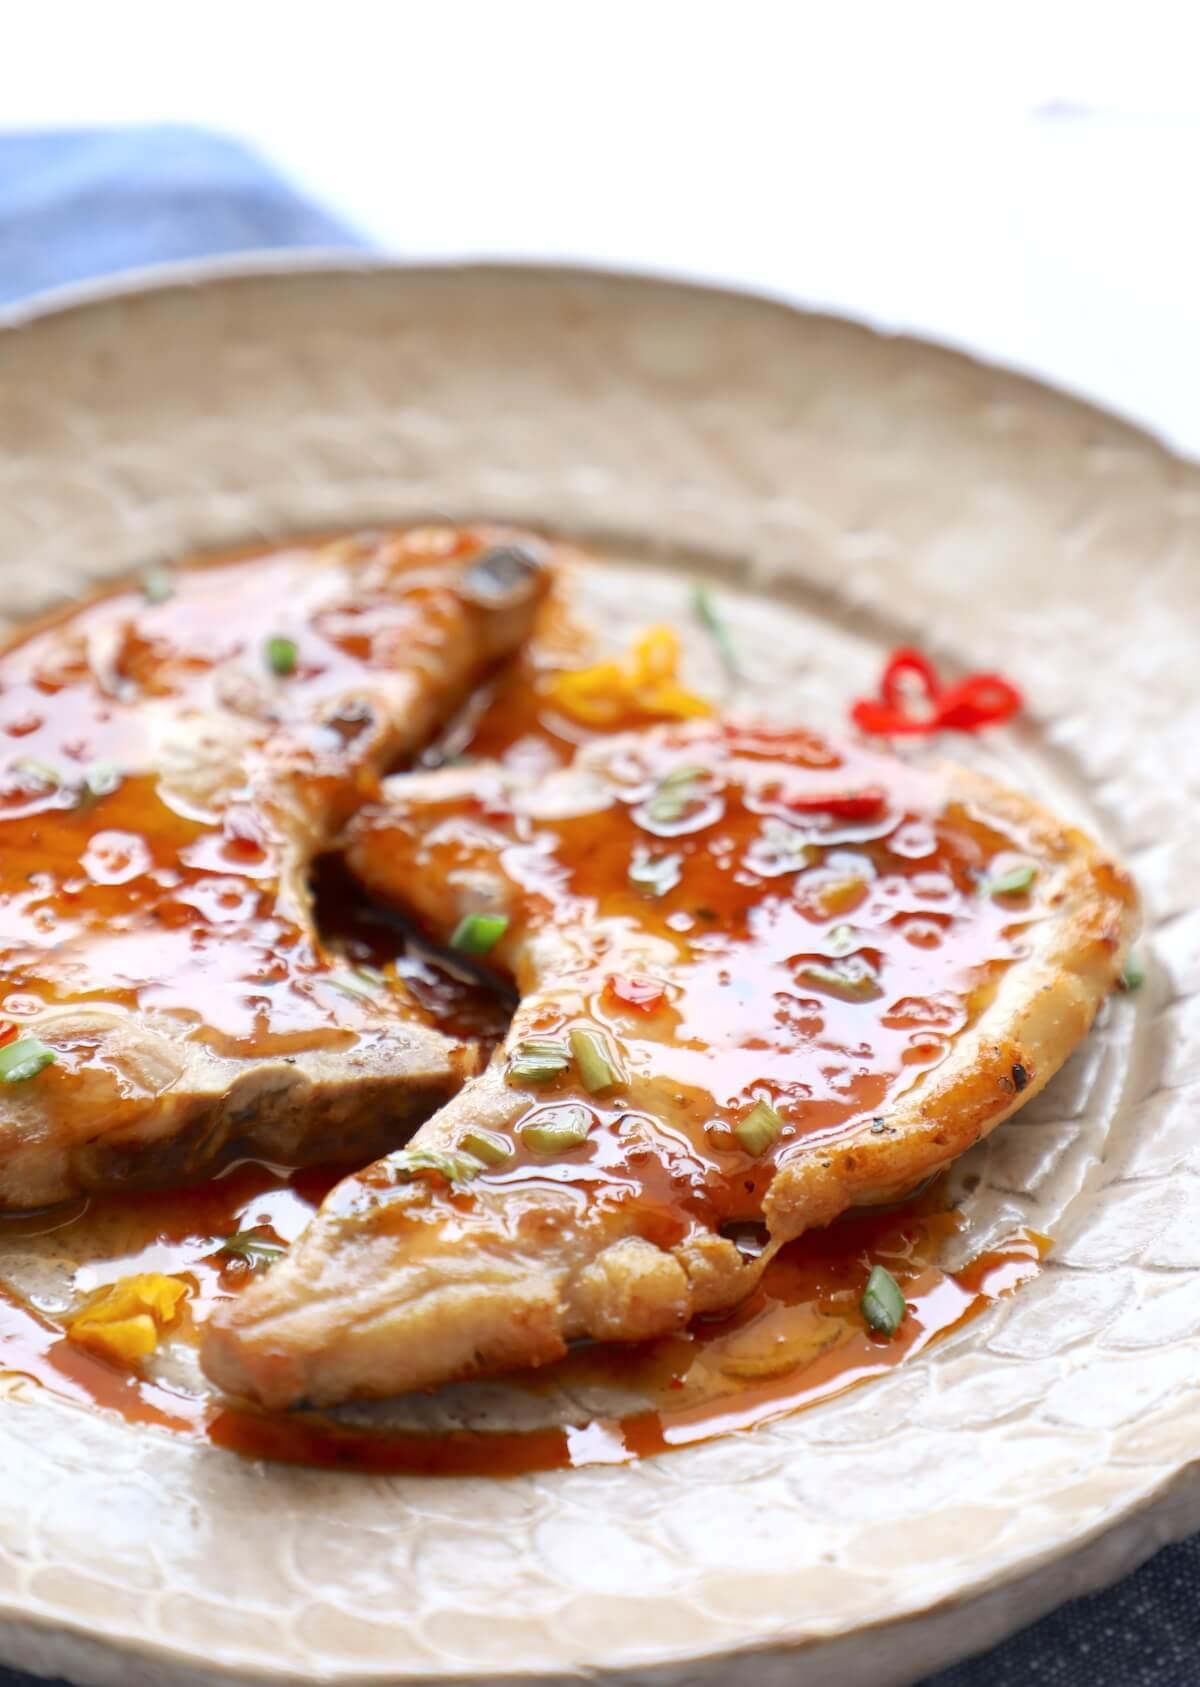 Sweet Chili Keto Pork Chops garnished with scallions